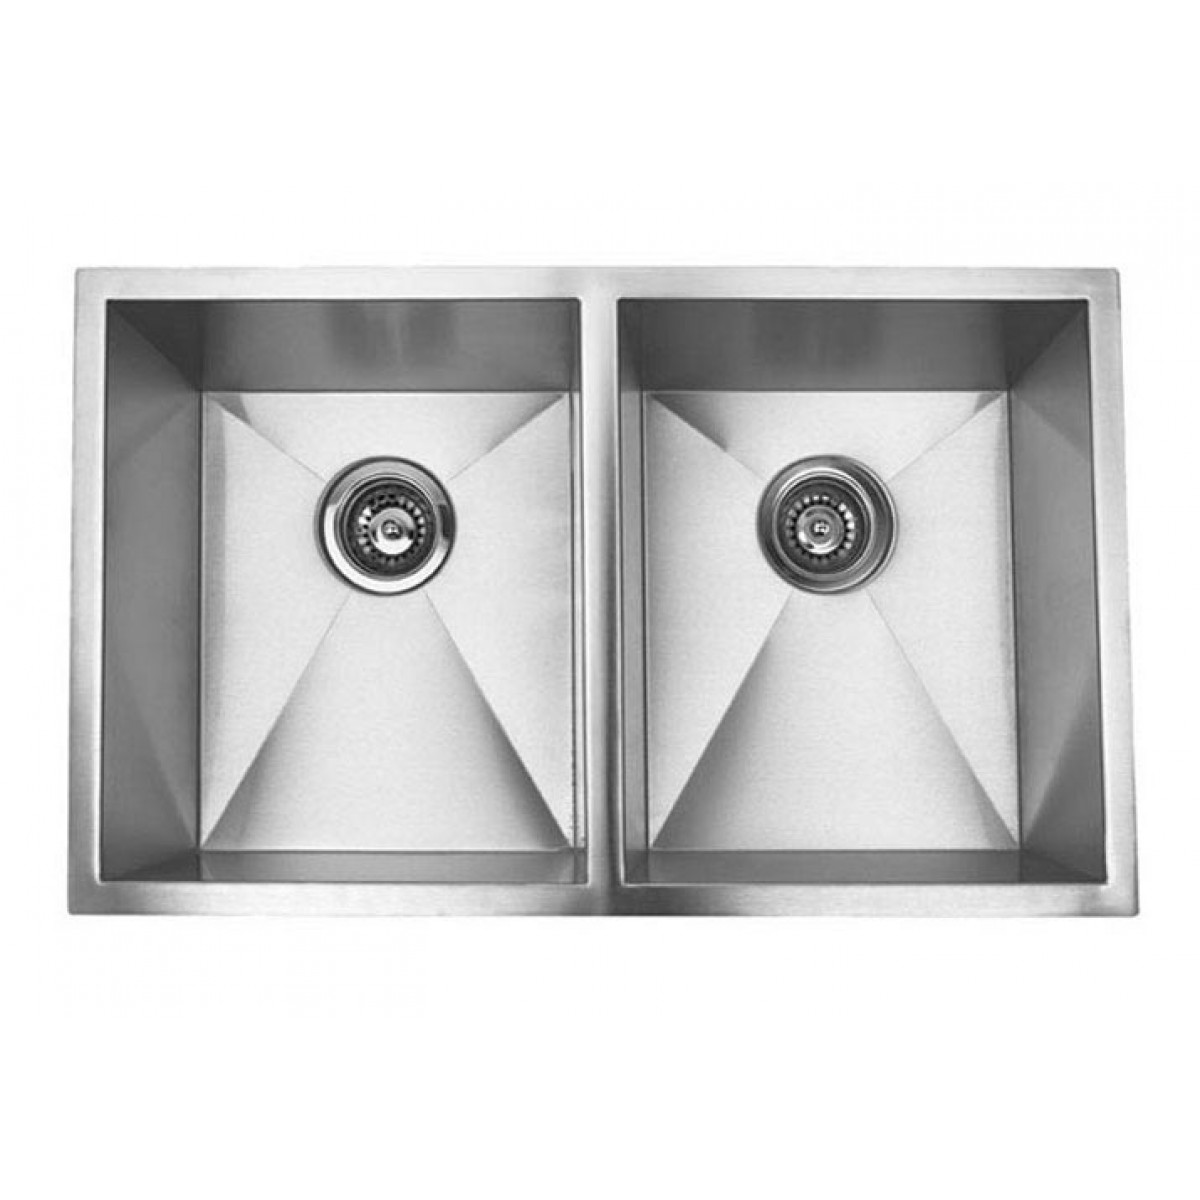 32 inch stainless steel undermount 40/60 double bowl kitchen sink